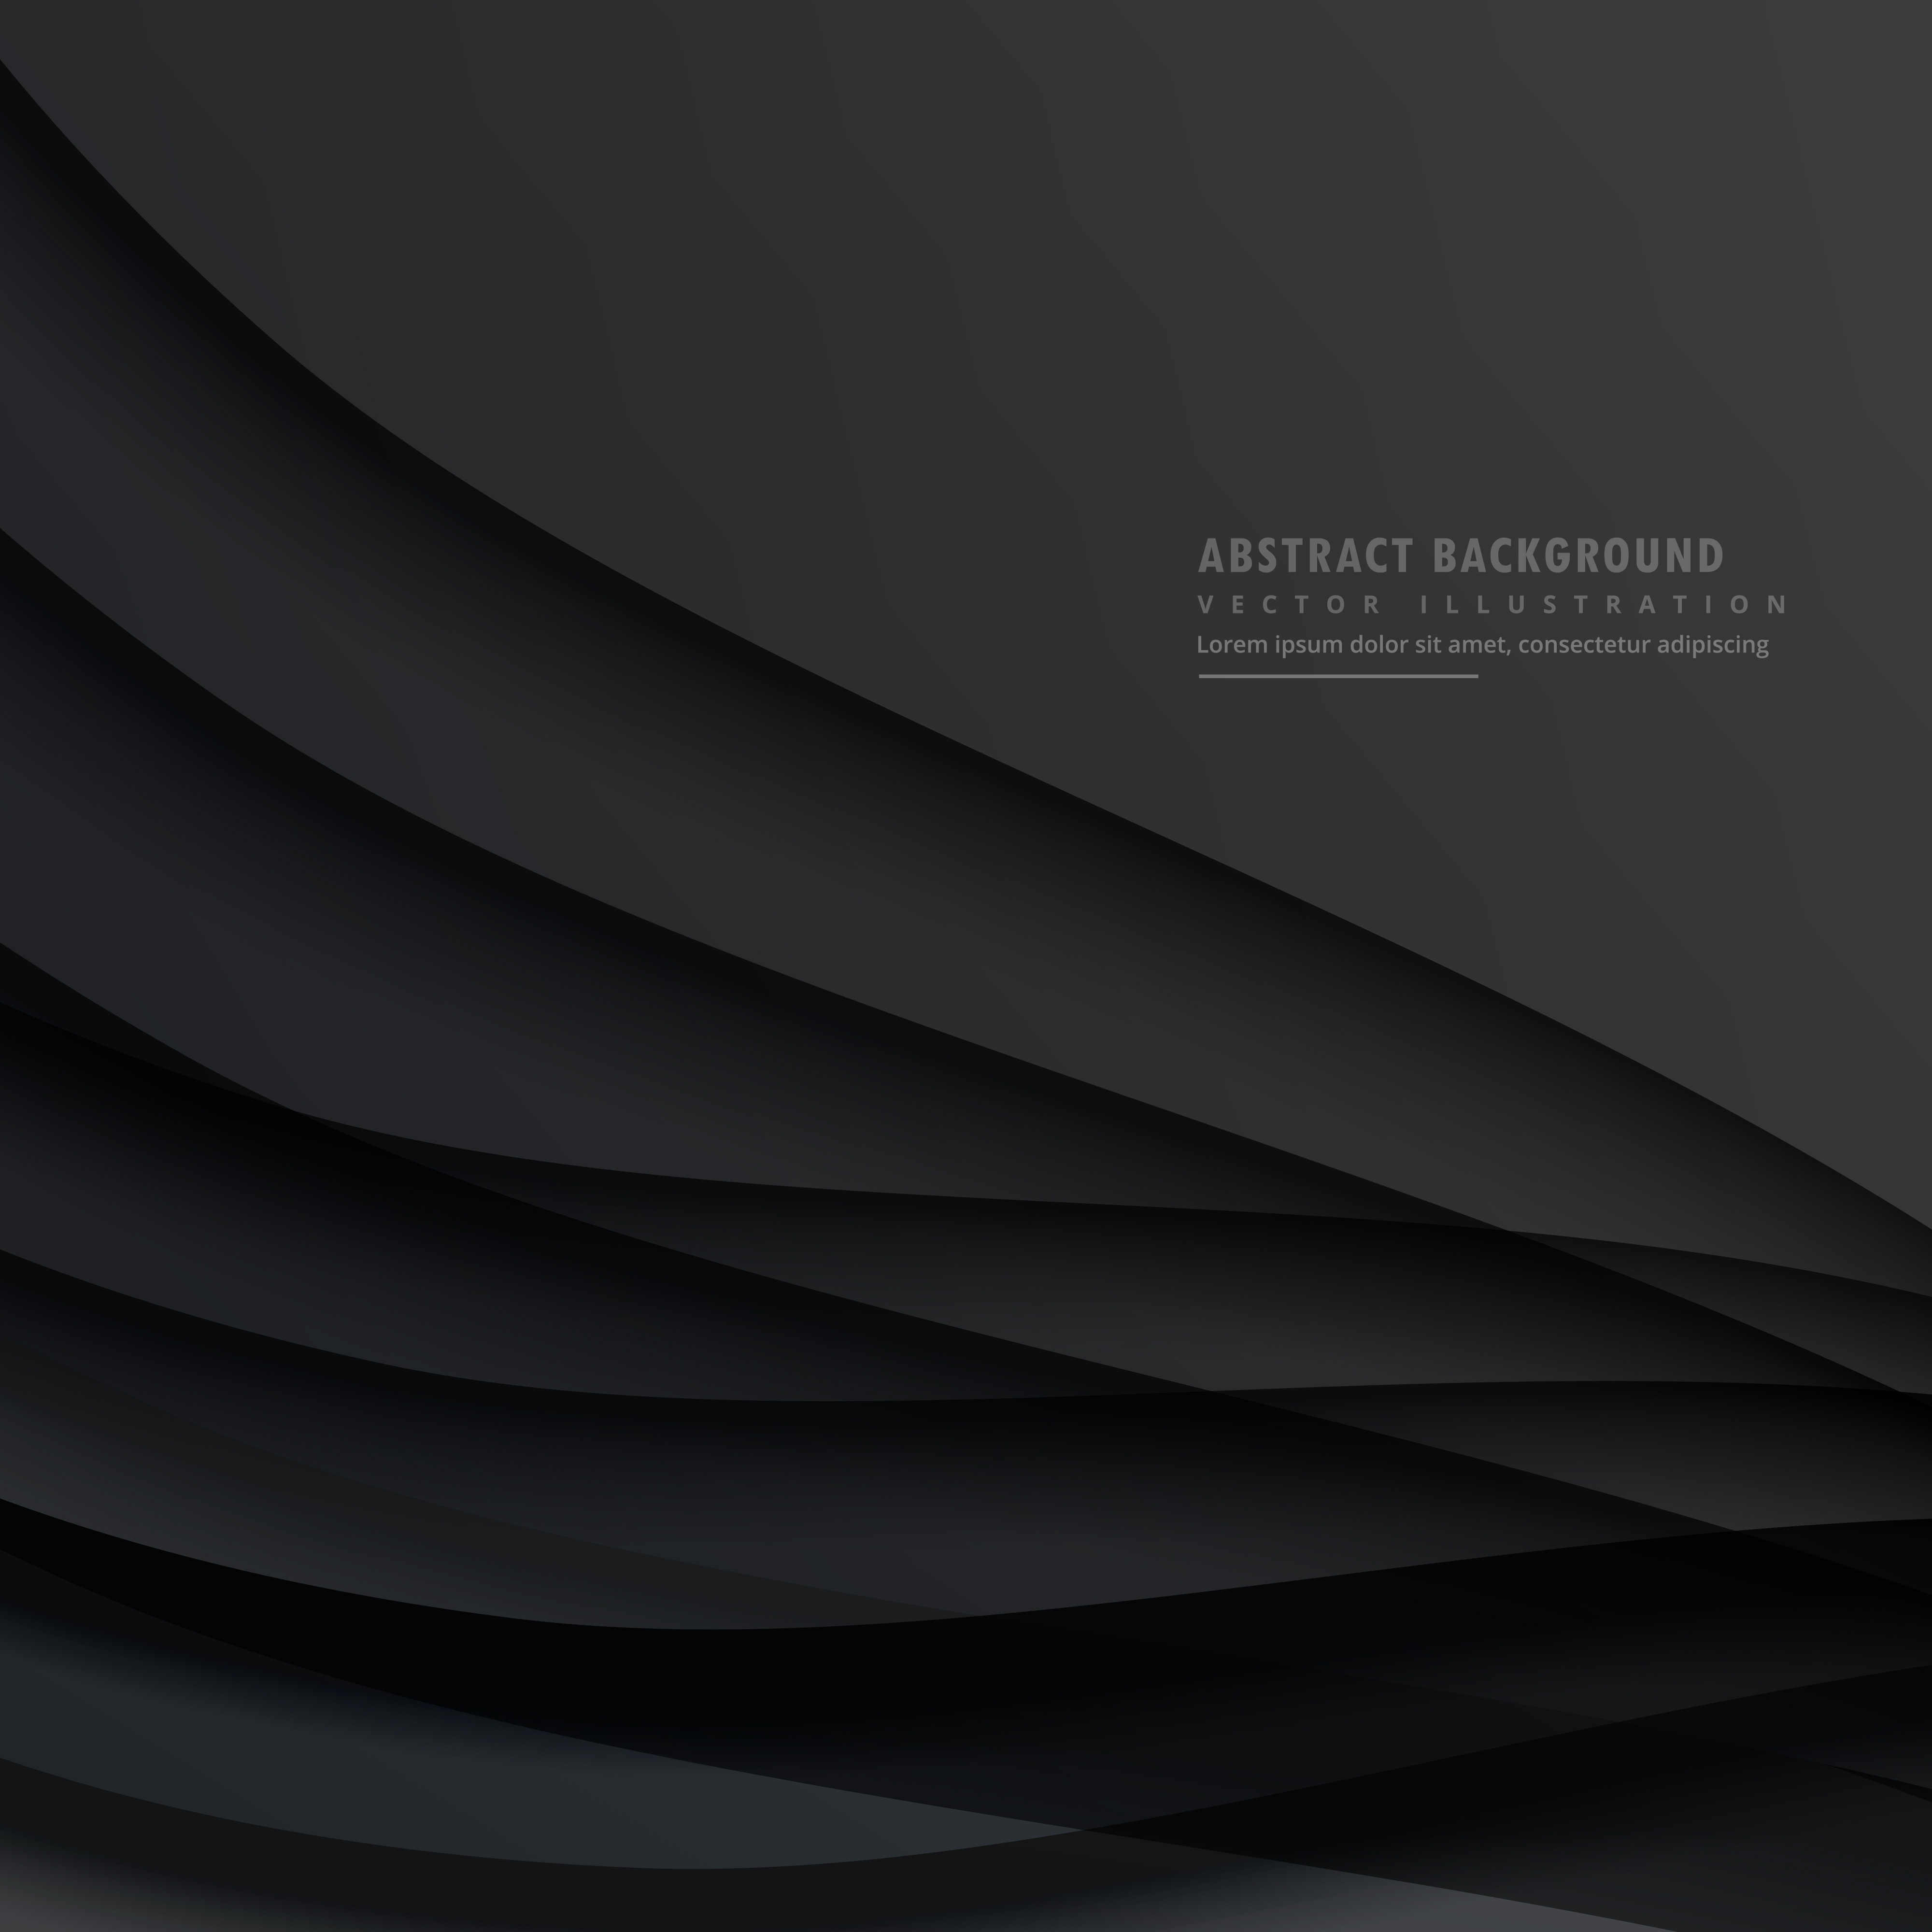 dark abstract background vector design - Download Free ... - photo #6